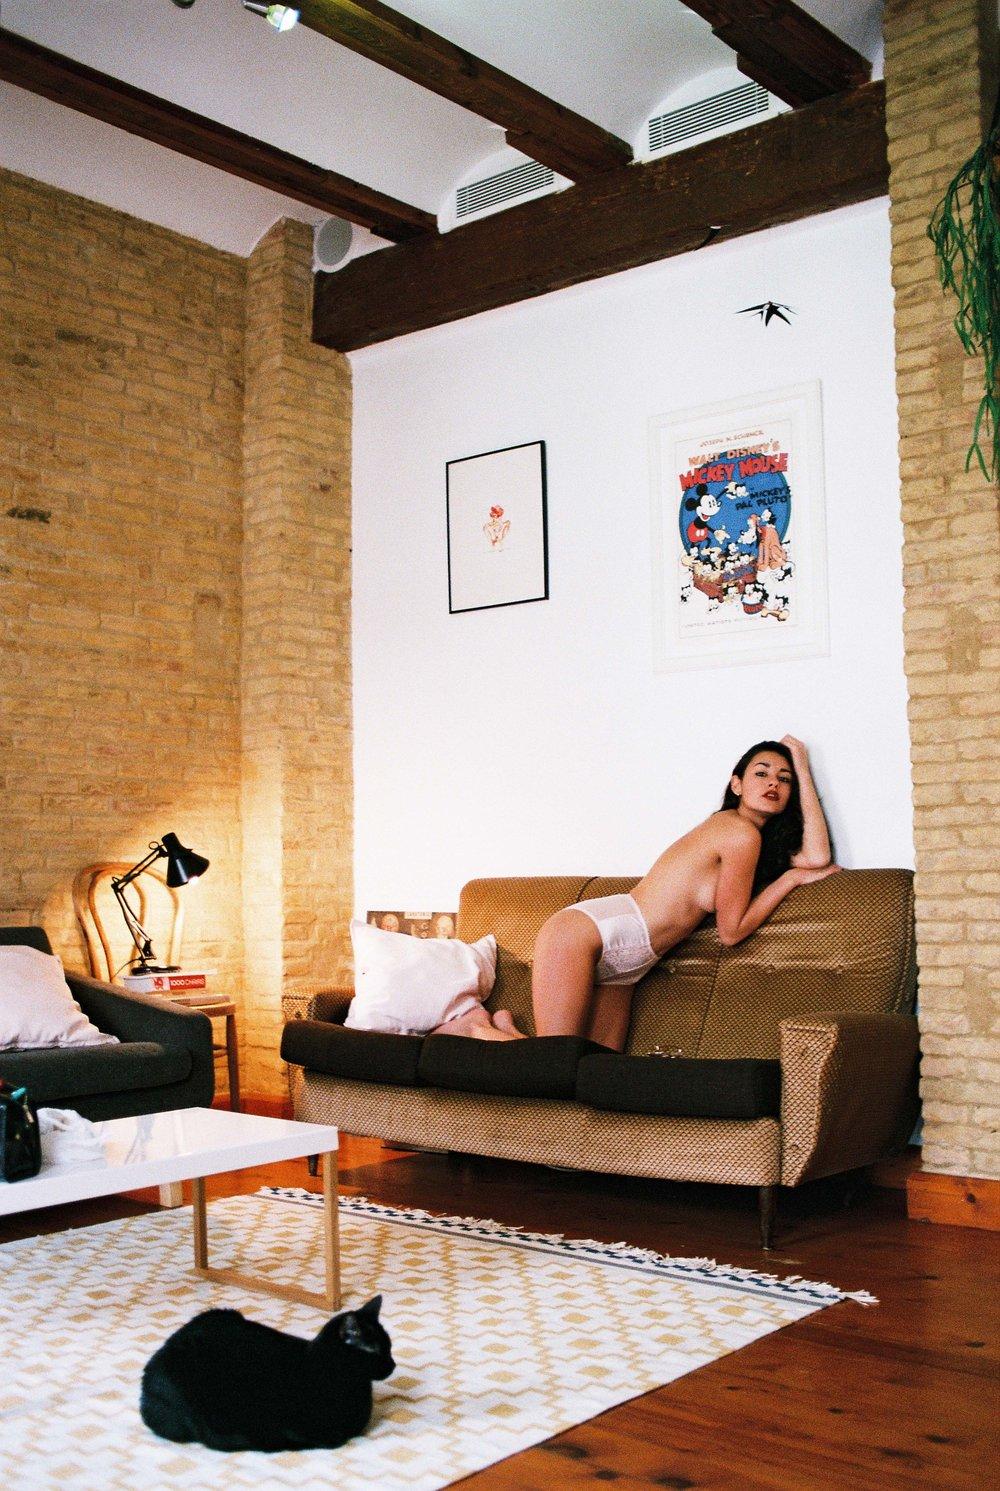 Carla Guetta by Hector Pozuelo